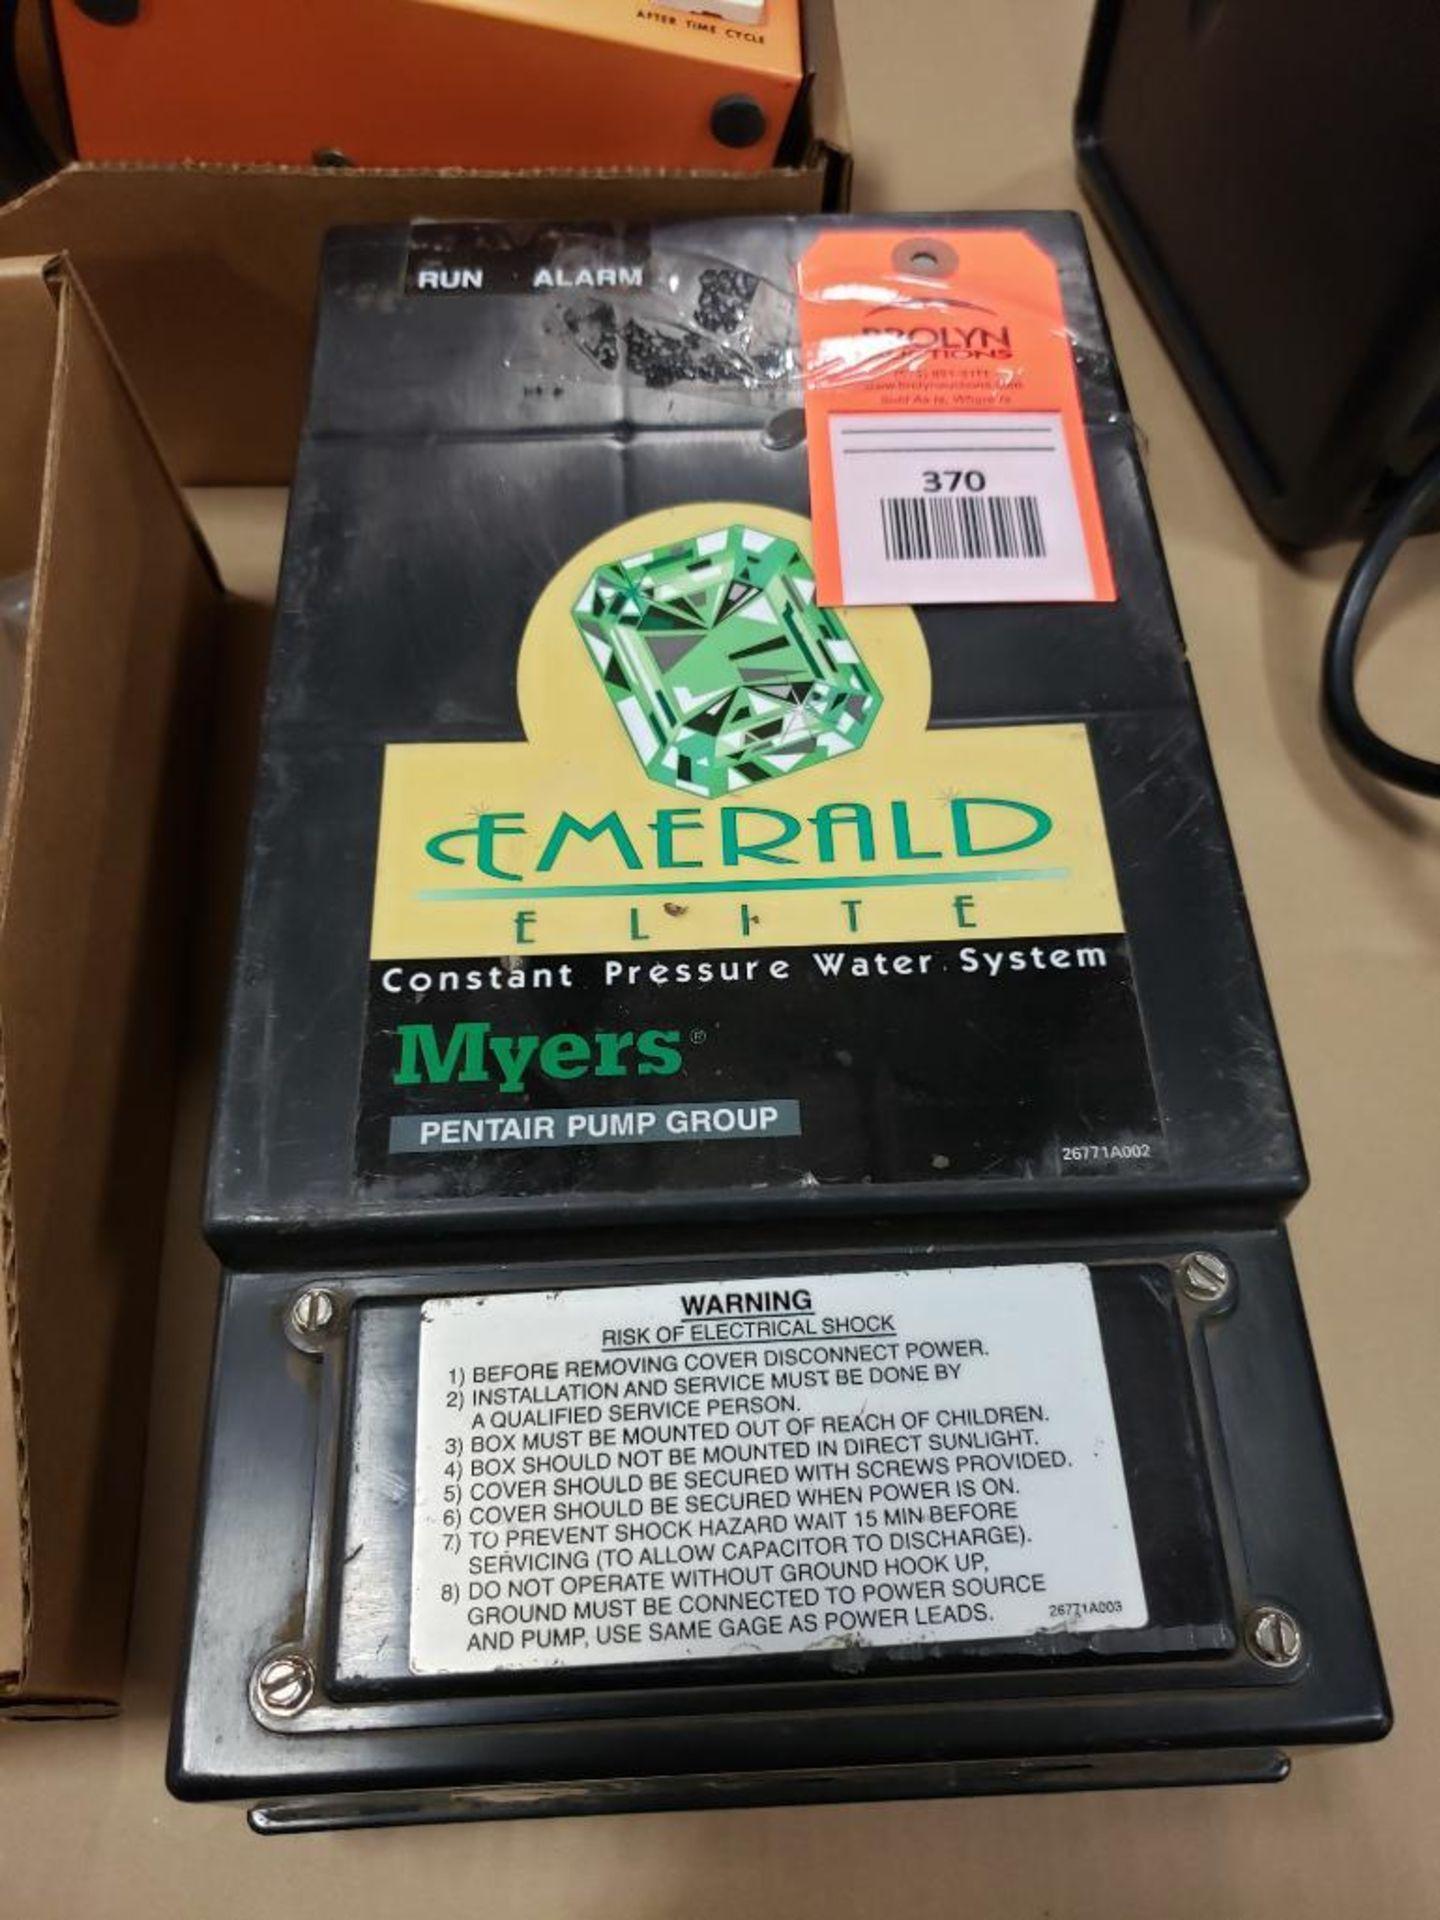 Emerald Elite Myers pentair pump group 26493D001. GEM10-CB.